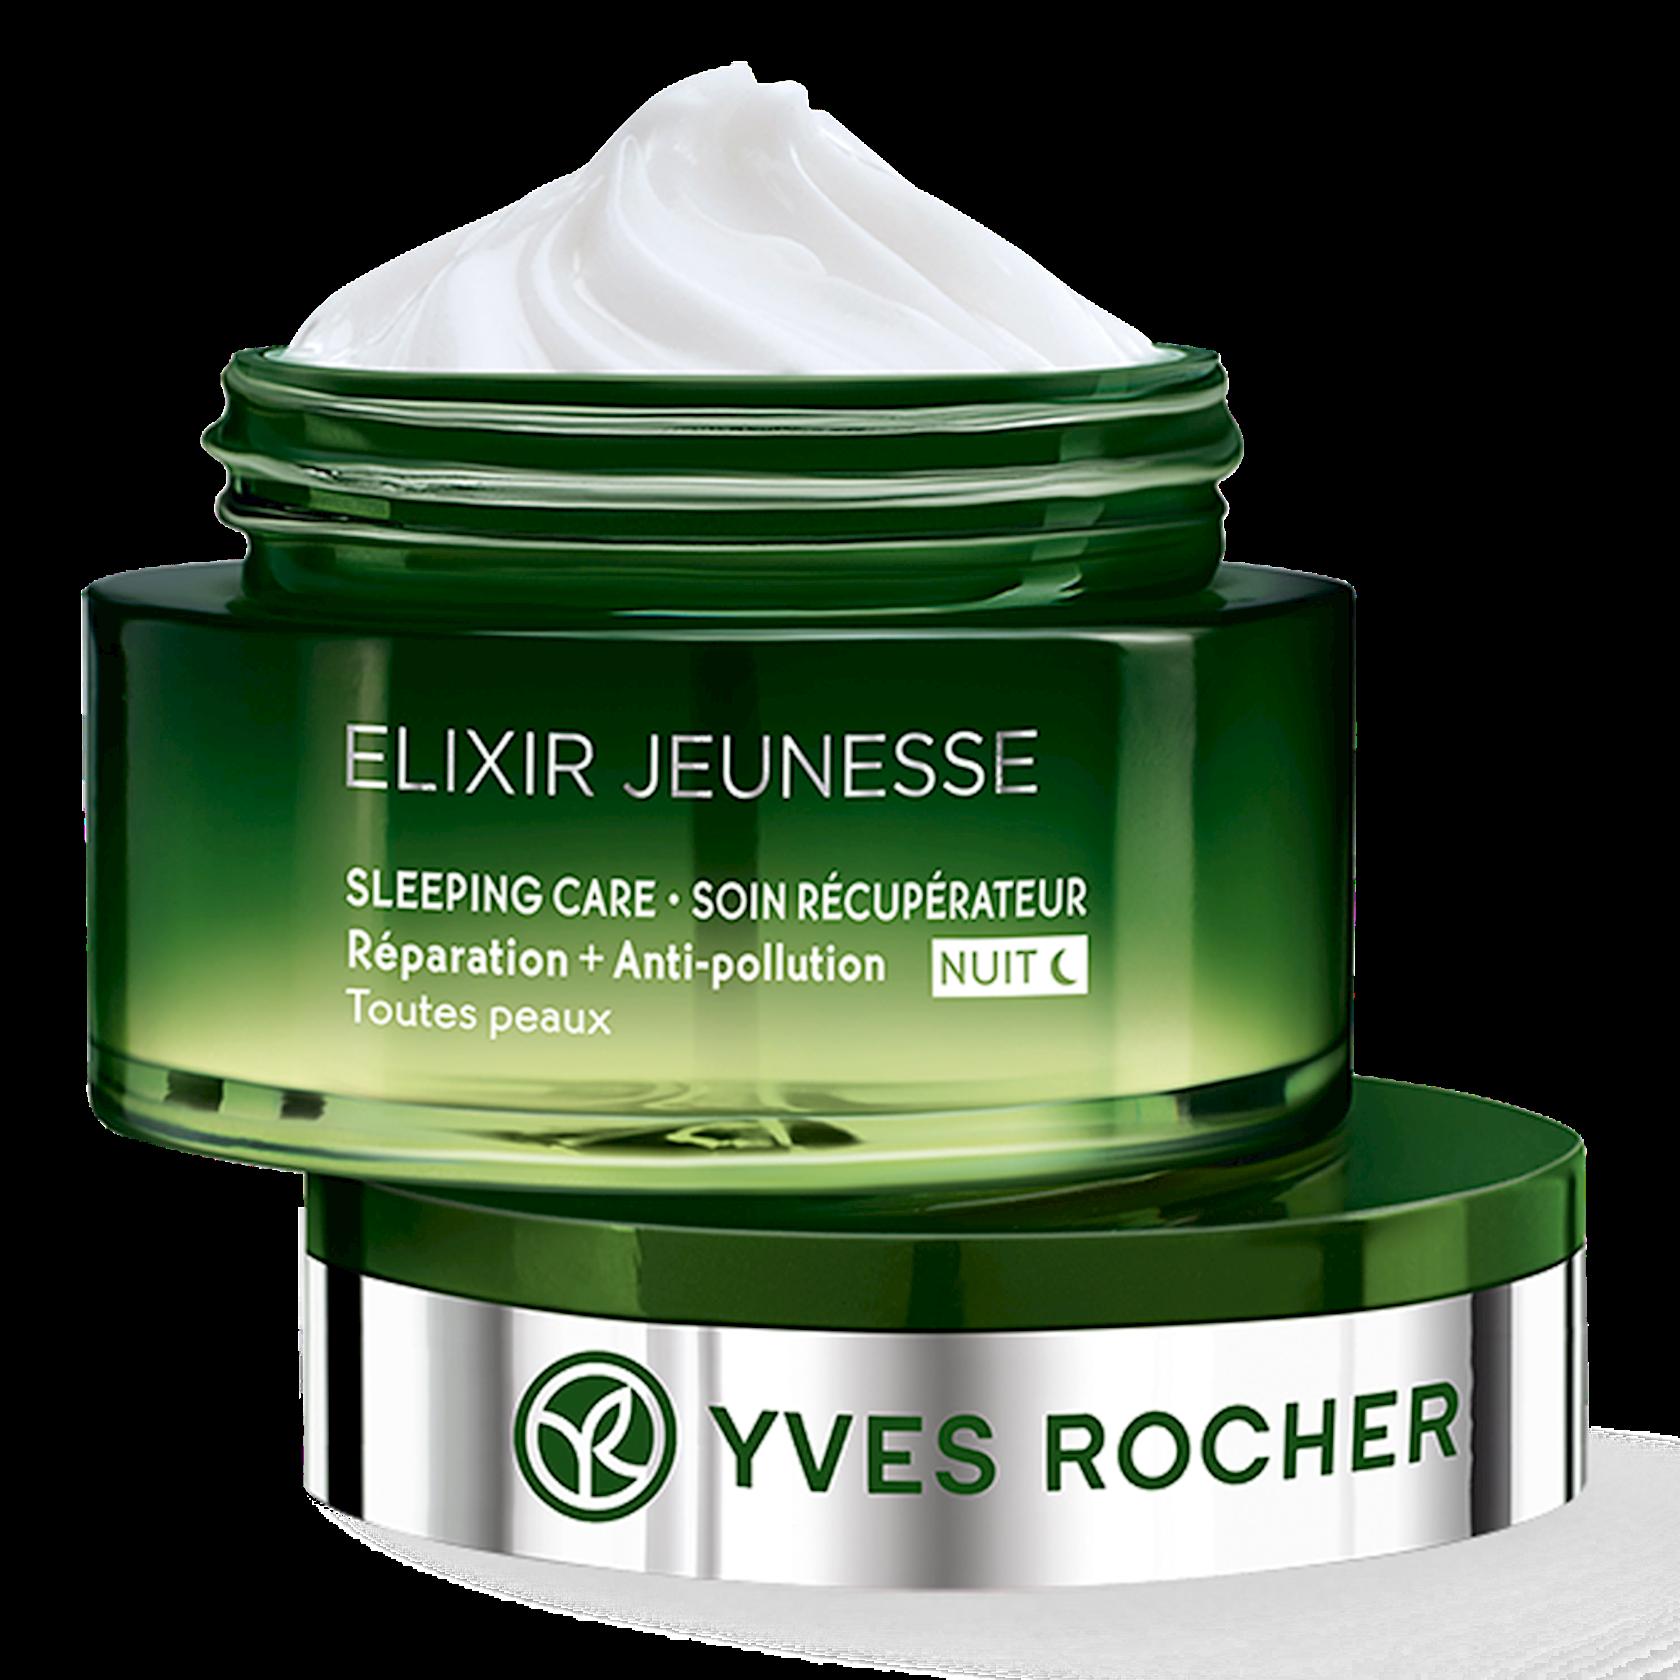 Üz üçün krem Yves Rocher Regenerating Night Cream Repair + Anti-pollution - All skin types